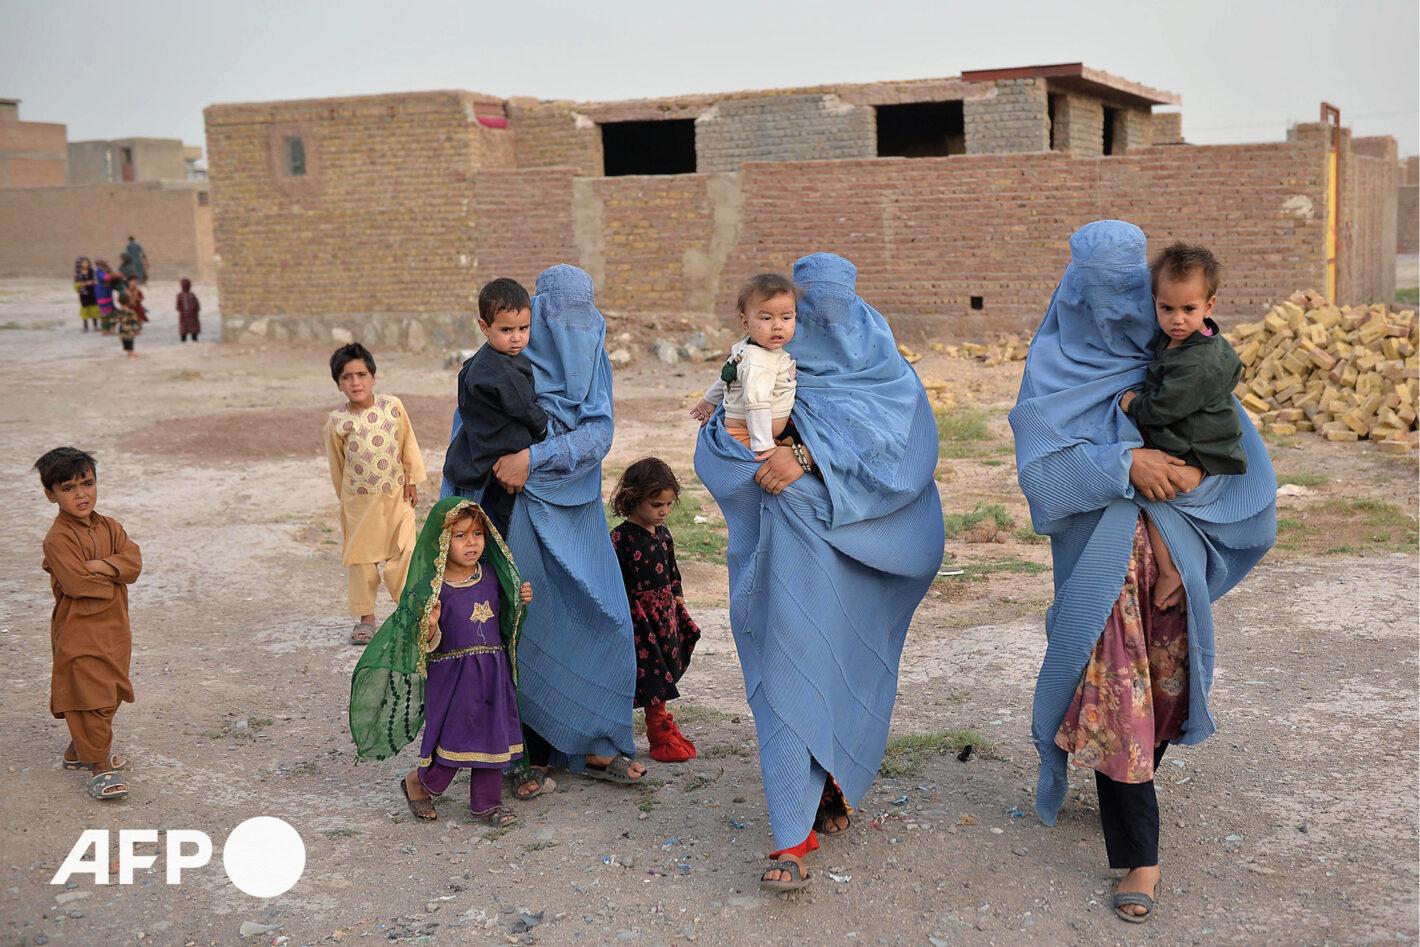 AFP 19 | Hoshang HASHIMI 8 juillet 2021 – Afghanistan